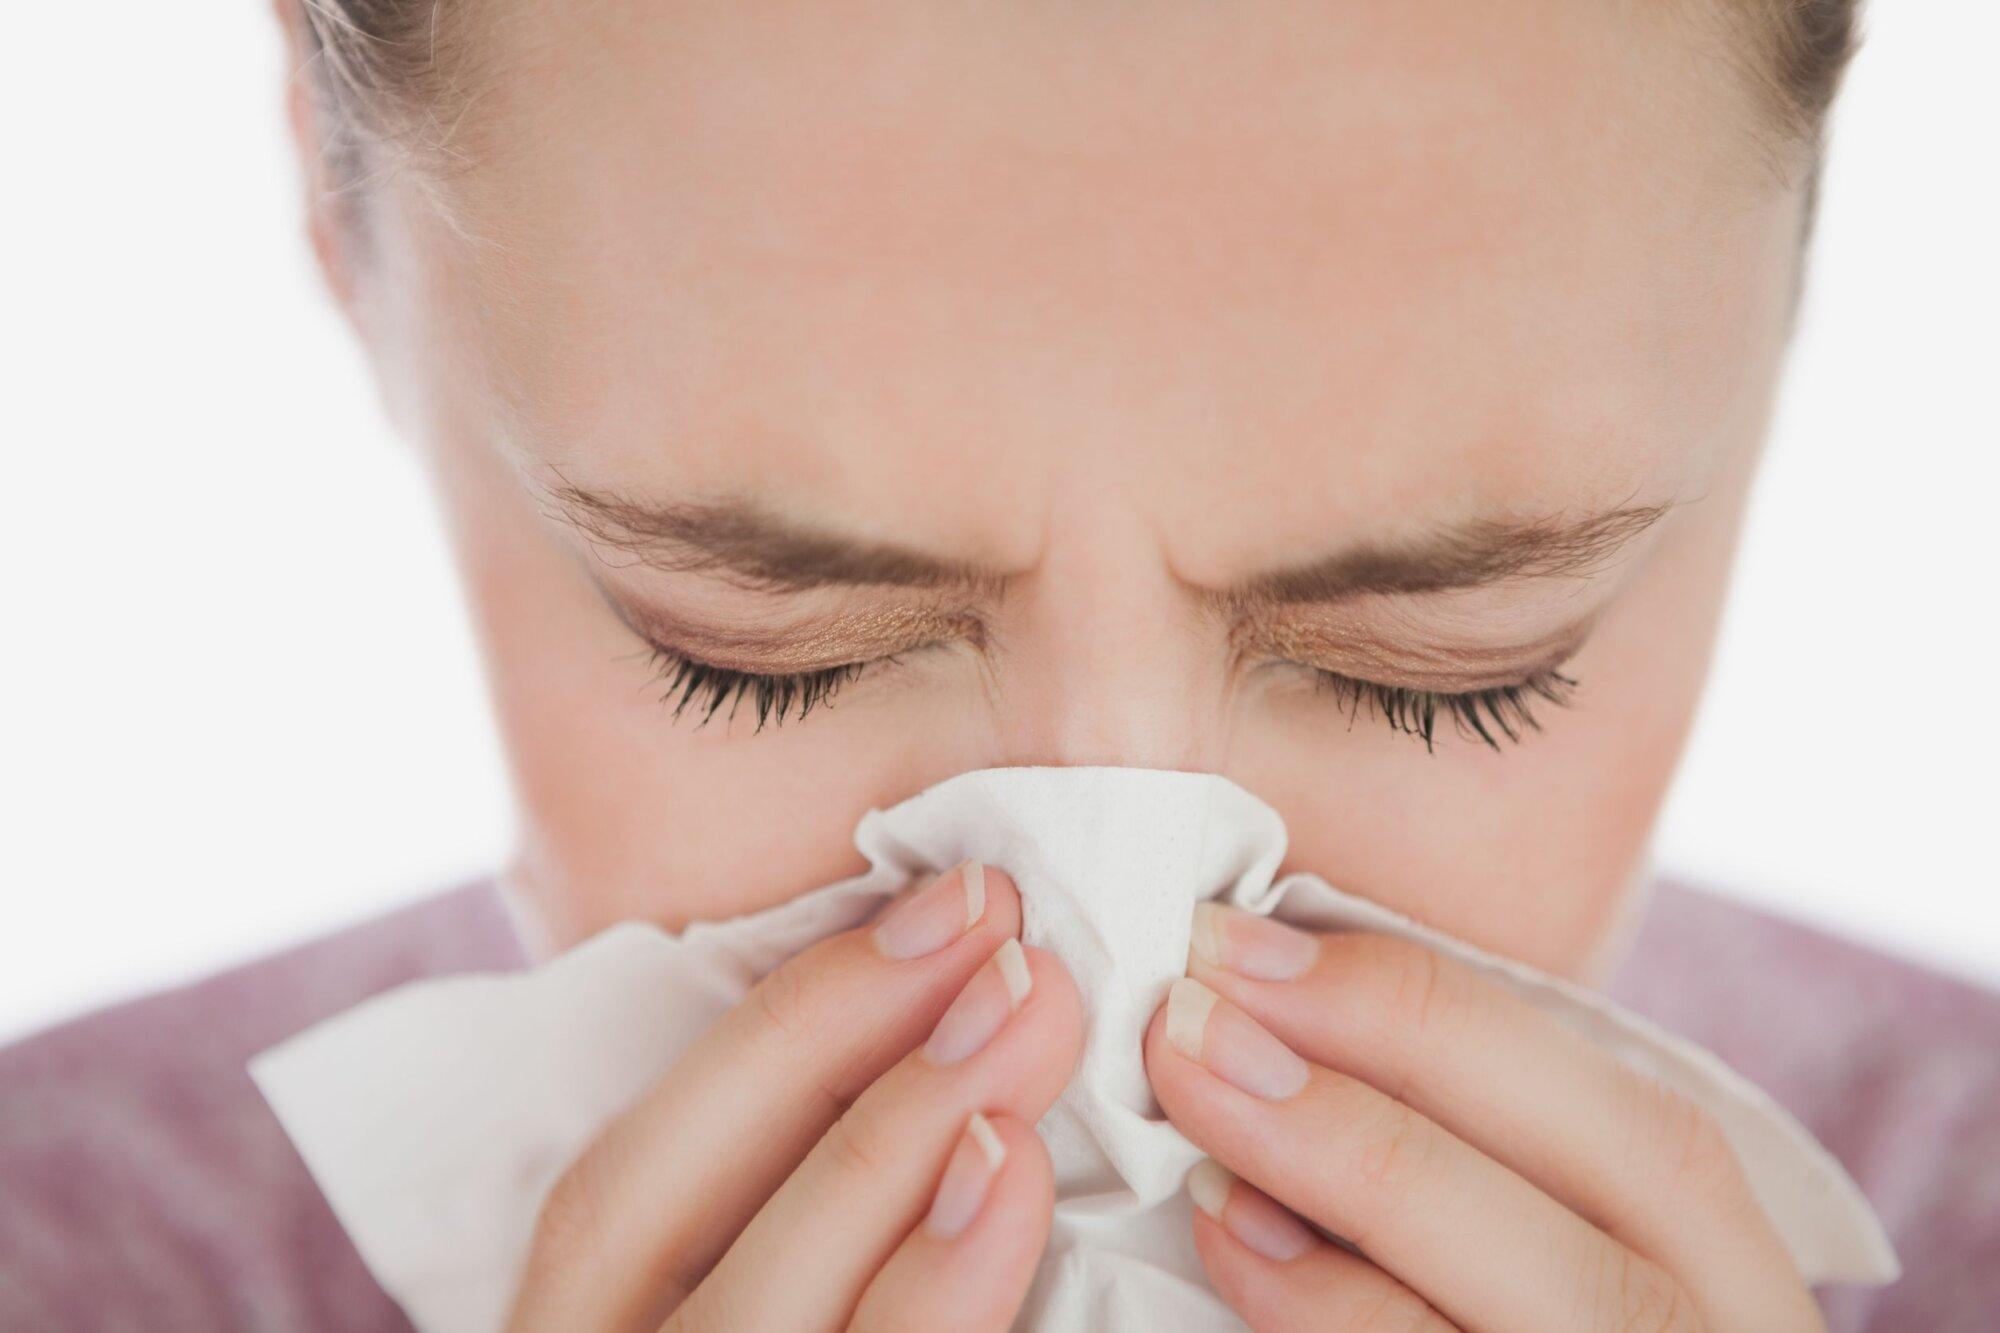 Curing Sinusitis